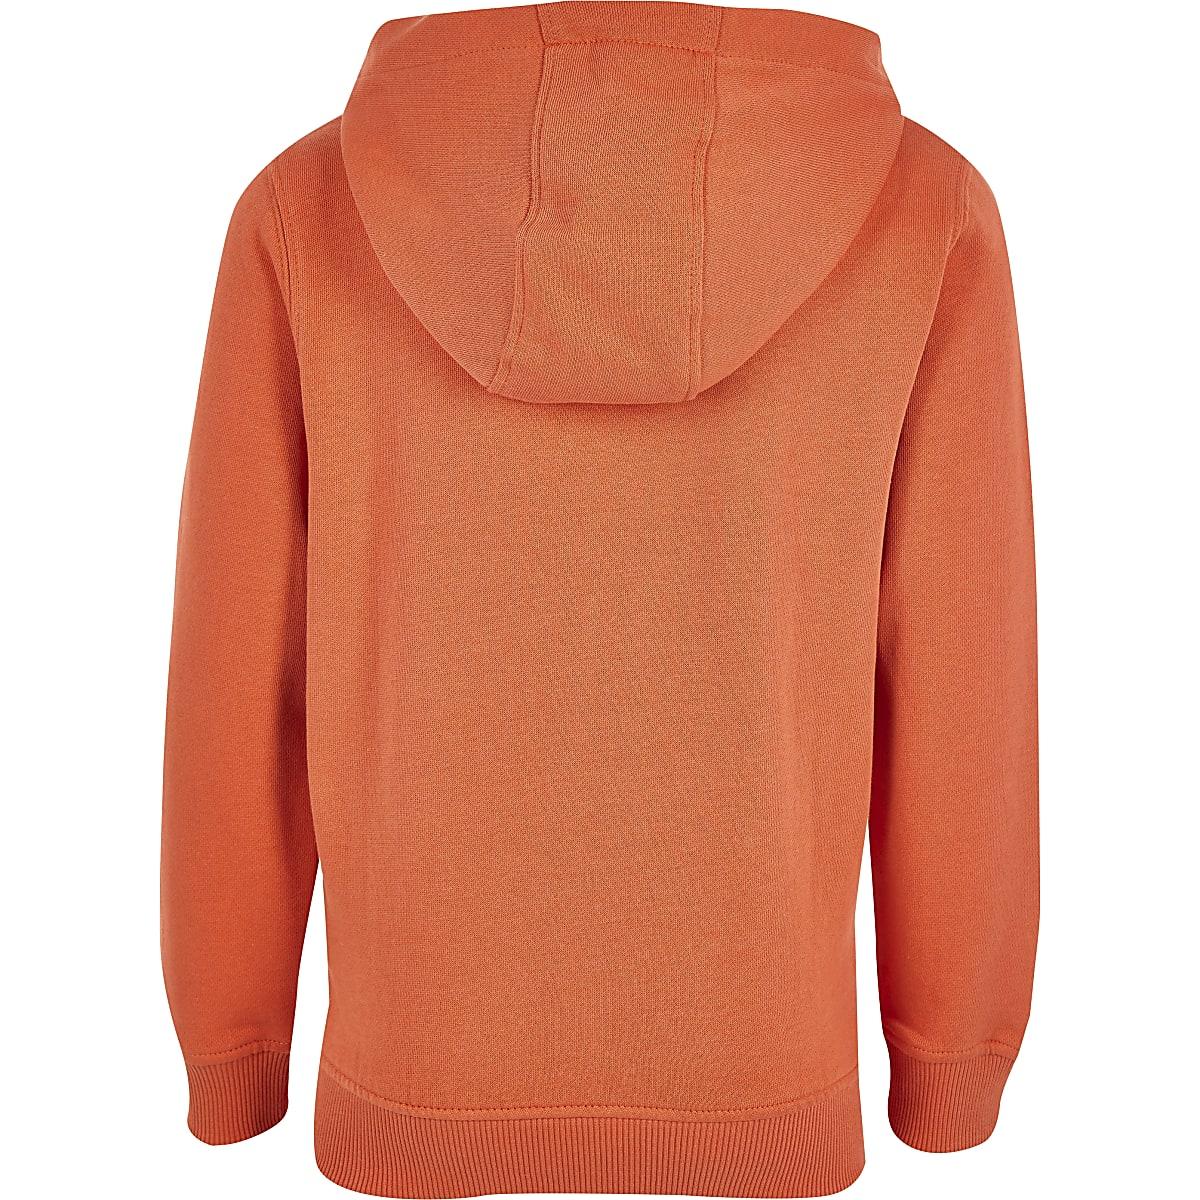 9faa4a581c9d Boys Franklin   Marshall orange zip hoodie - Hoodies   Sweatshirts - boys